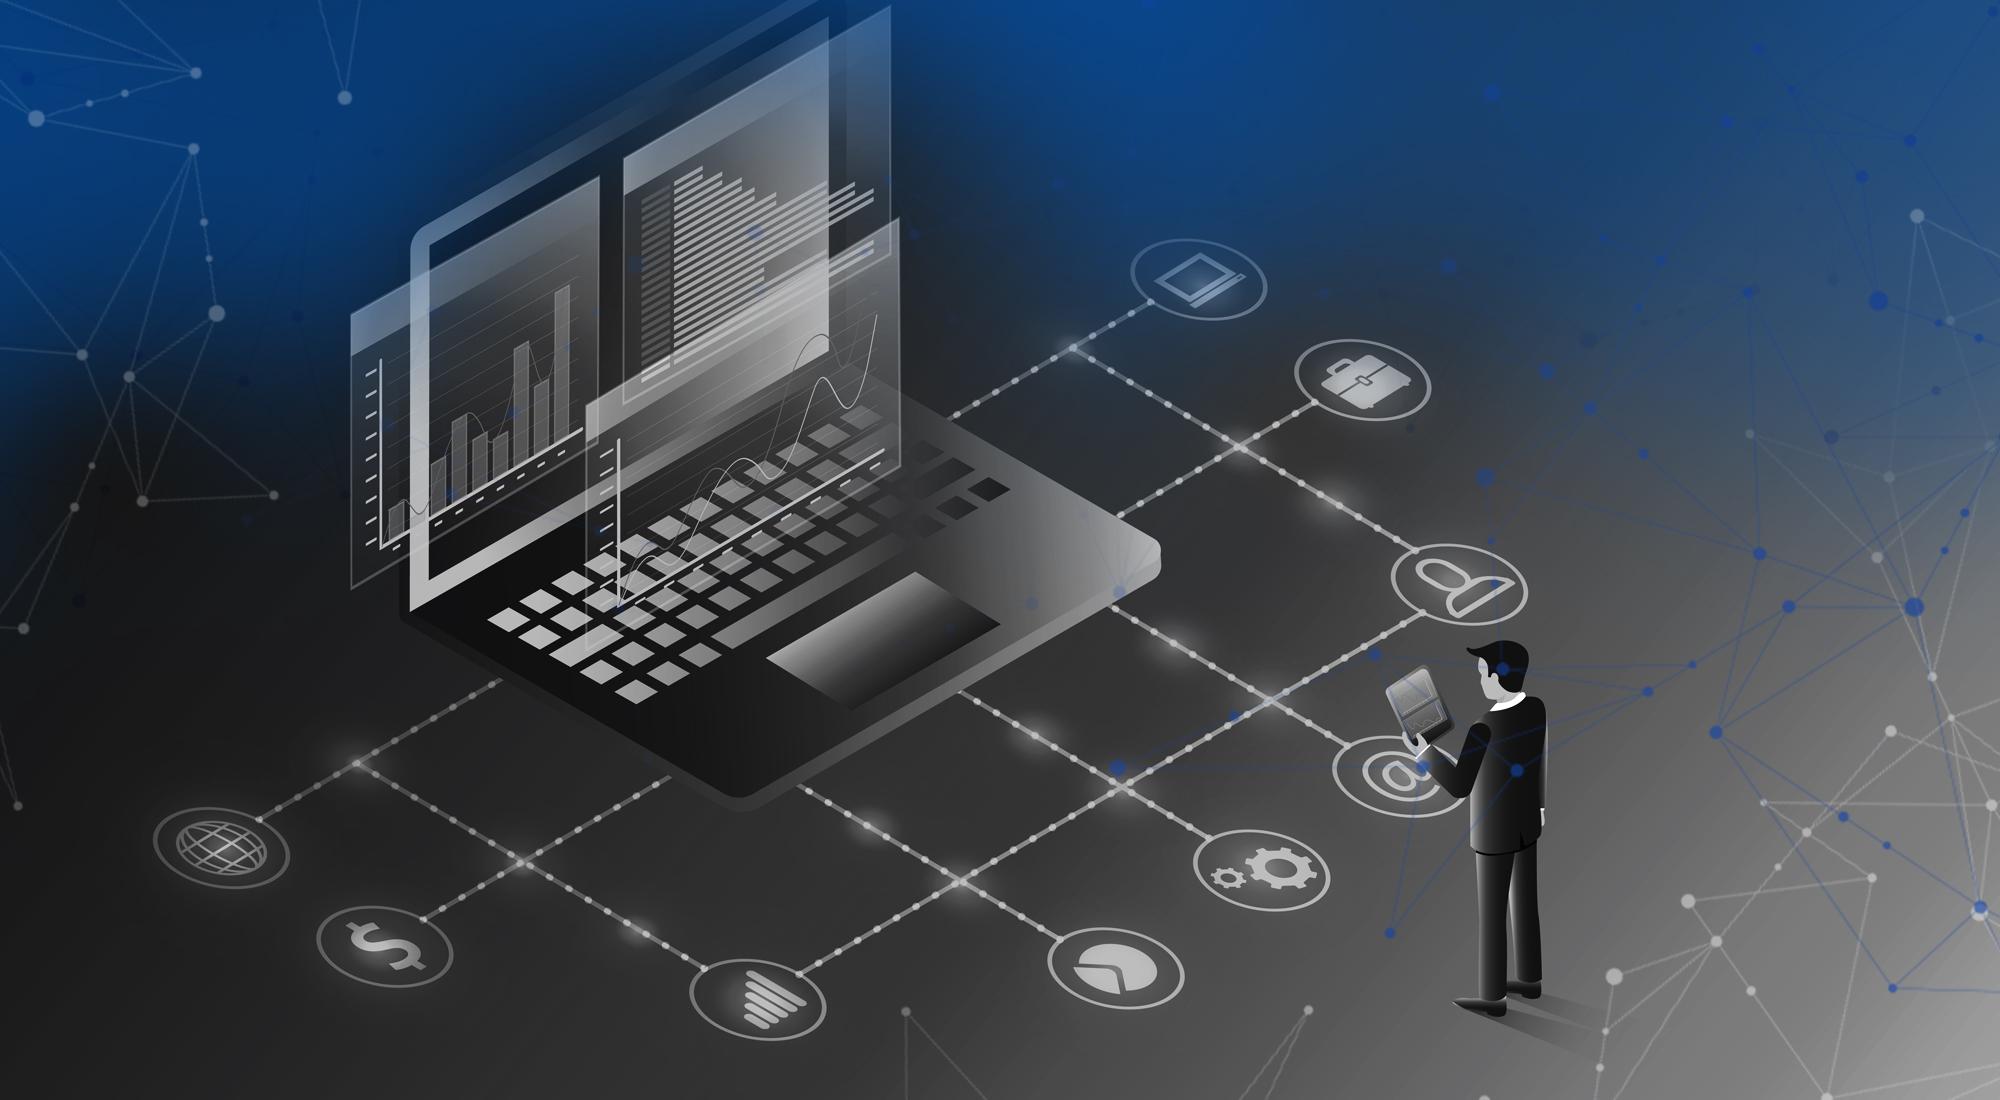 IT Support Services in Dubai UAE